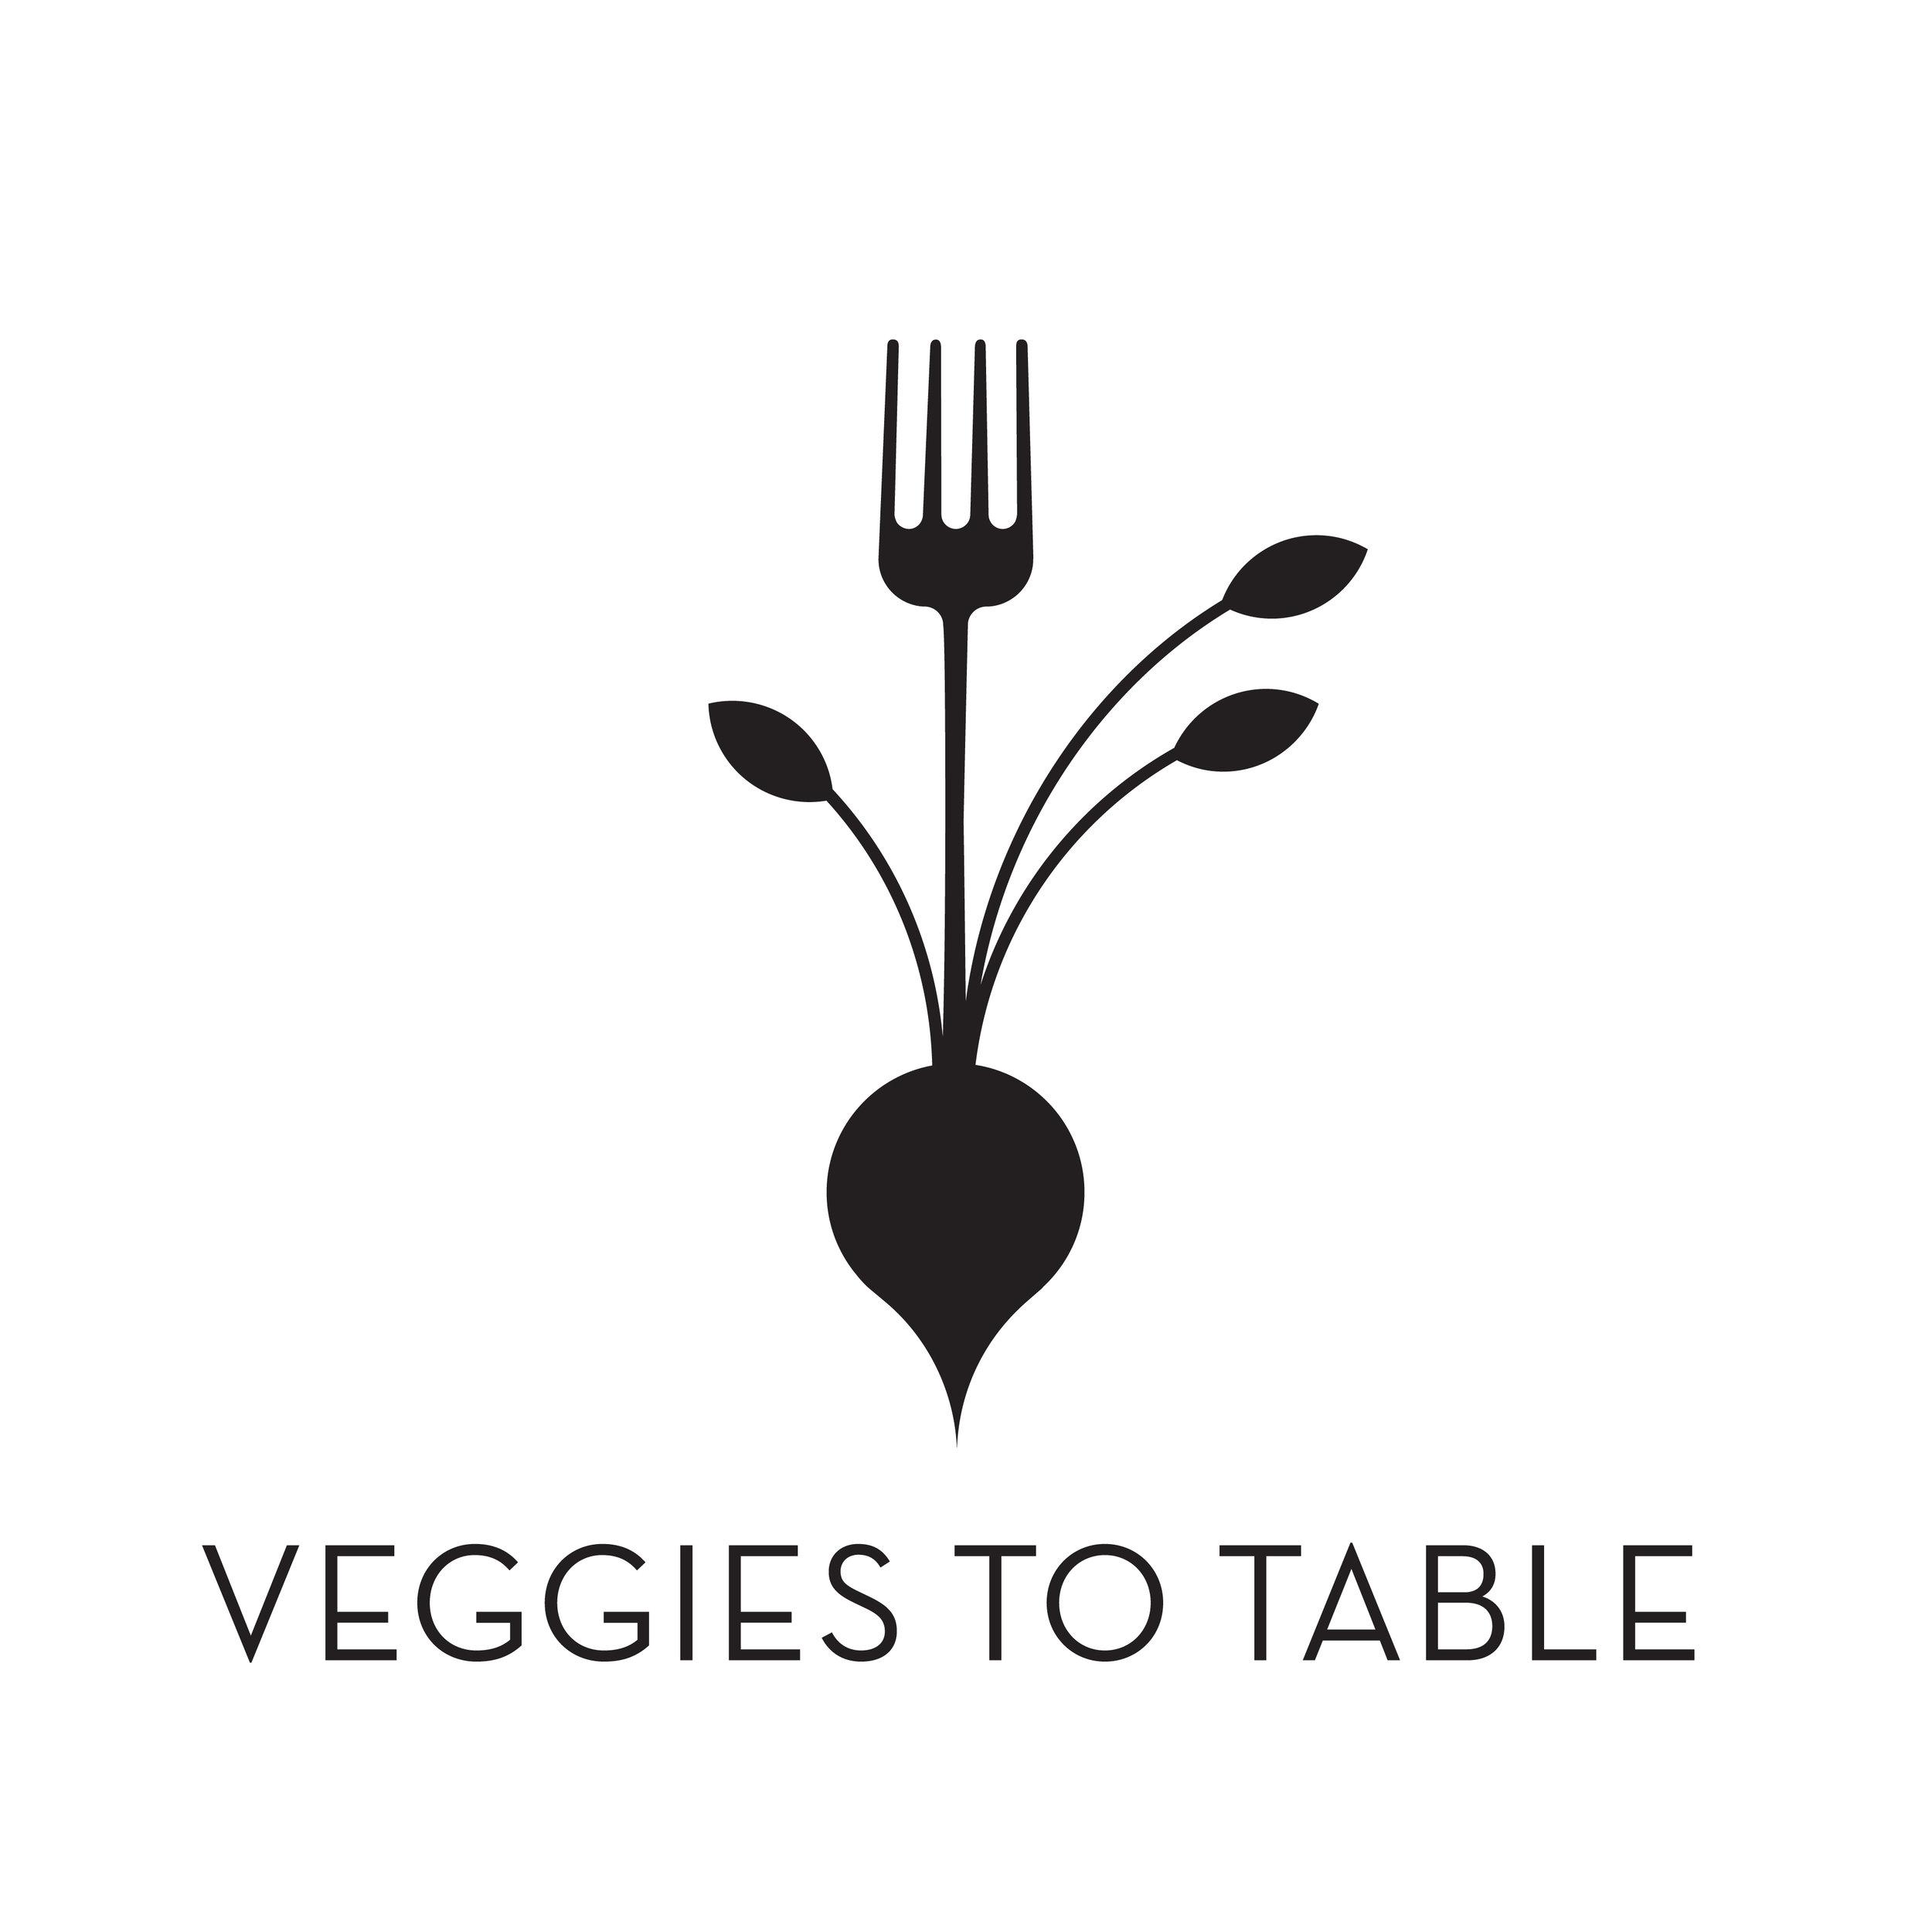 VeggiestoTableLogos_v9-01.jpg